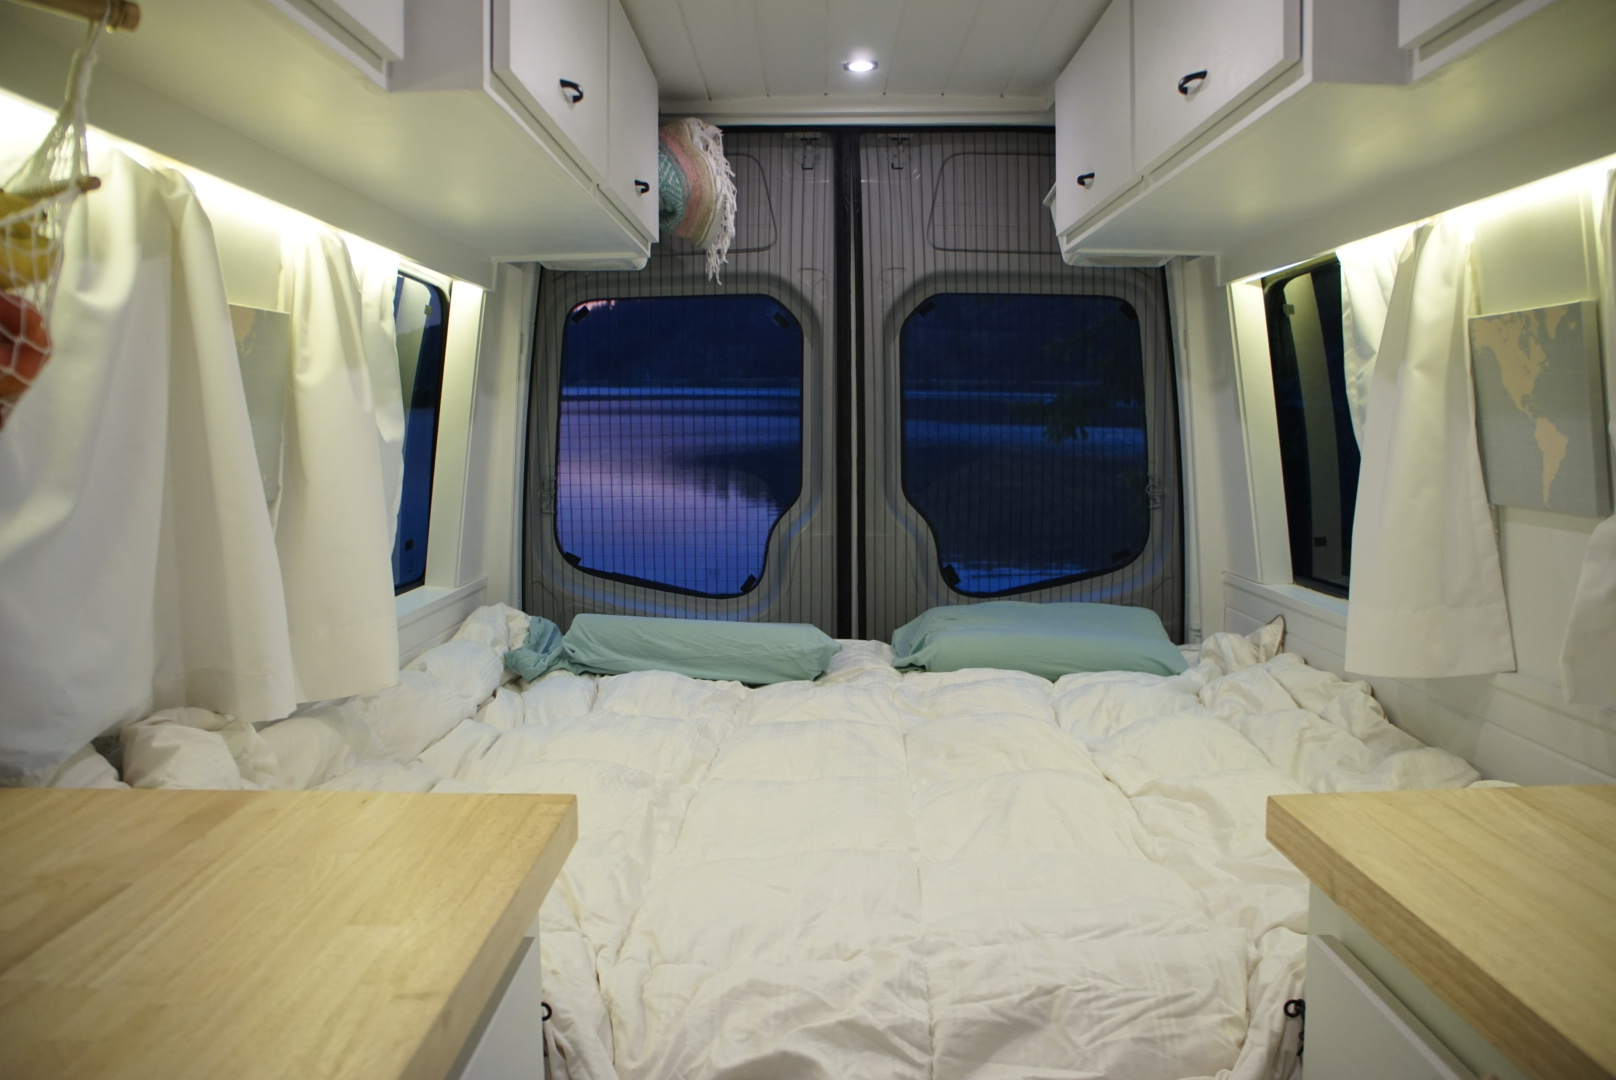 40 hours of freedom bed conversion sprinter van